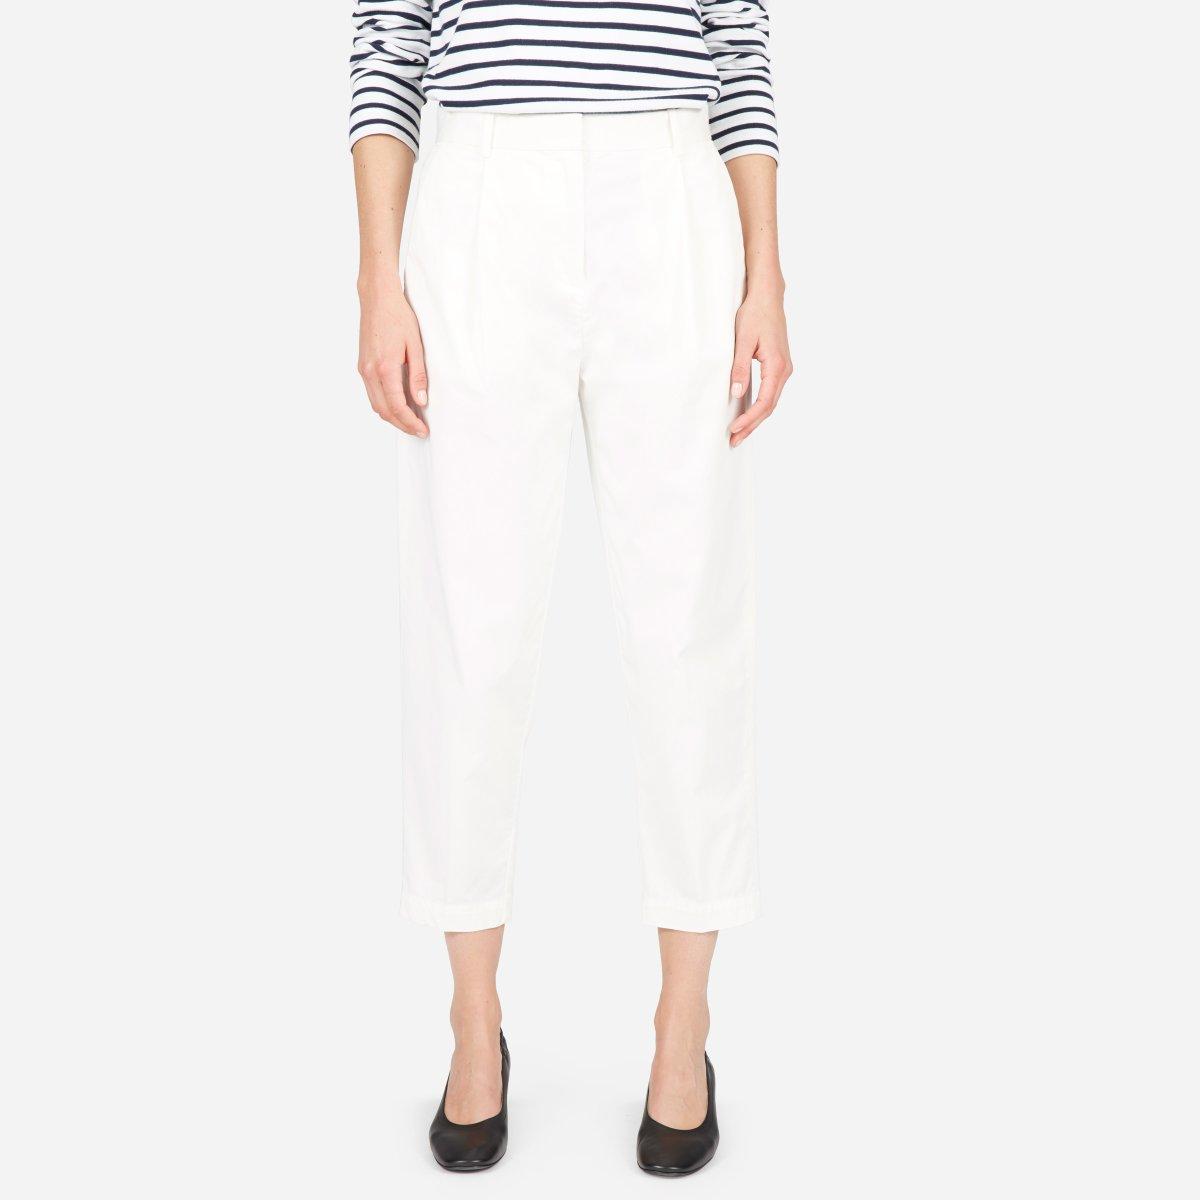 Everlane Choose What You Pay / Slouchy Chino Pant - Sunshine Style, A Florida Based Fashion Blog